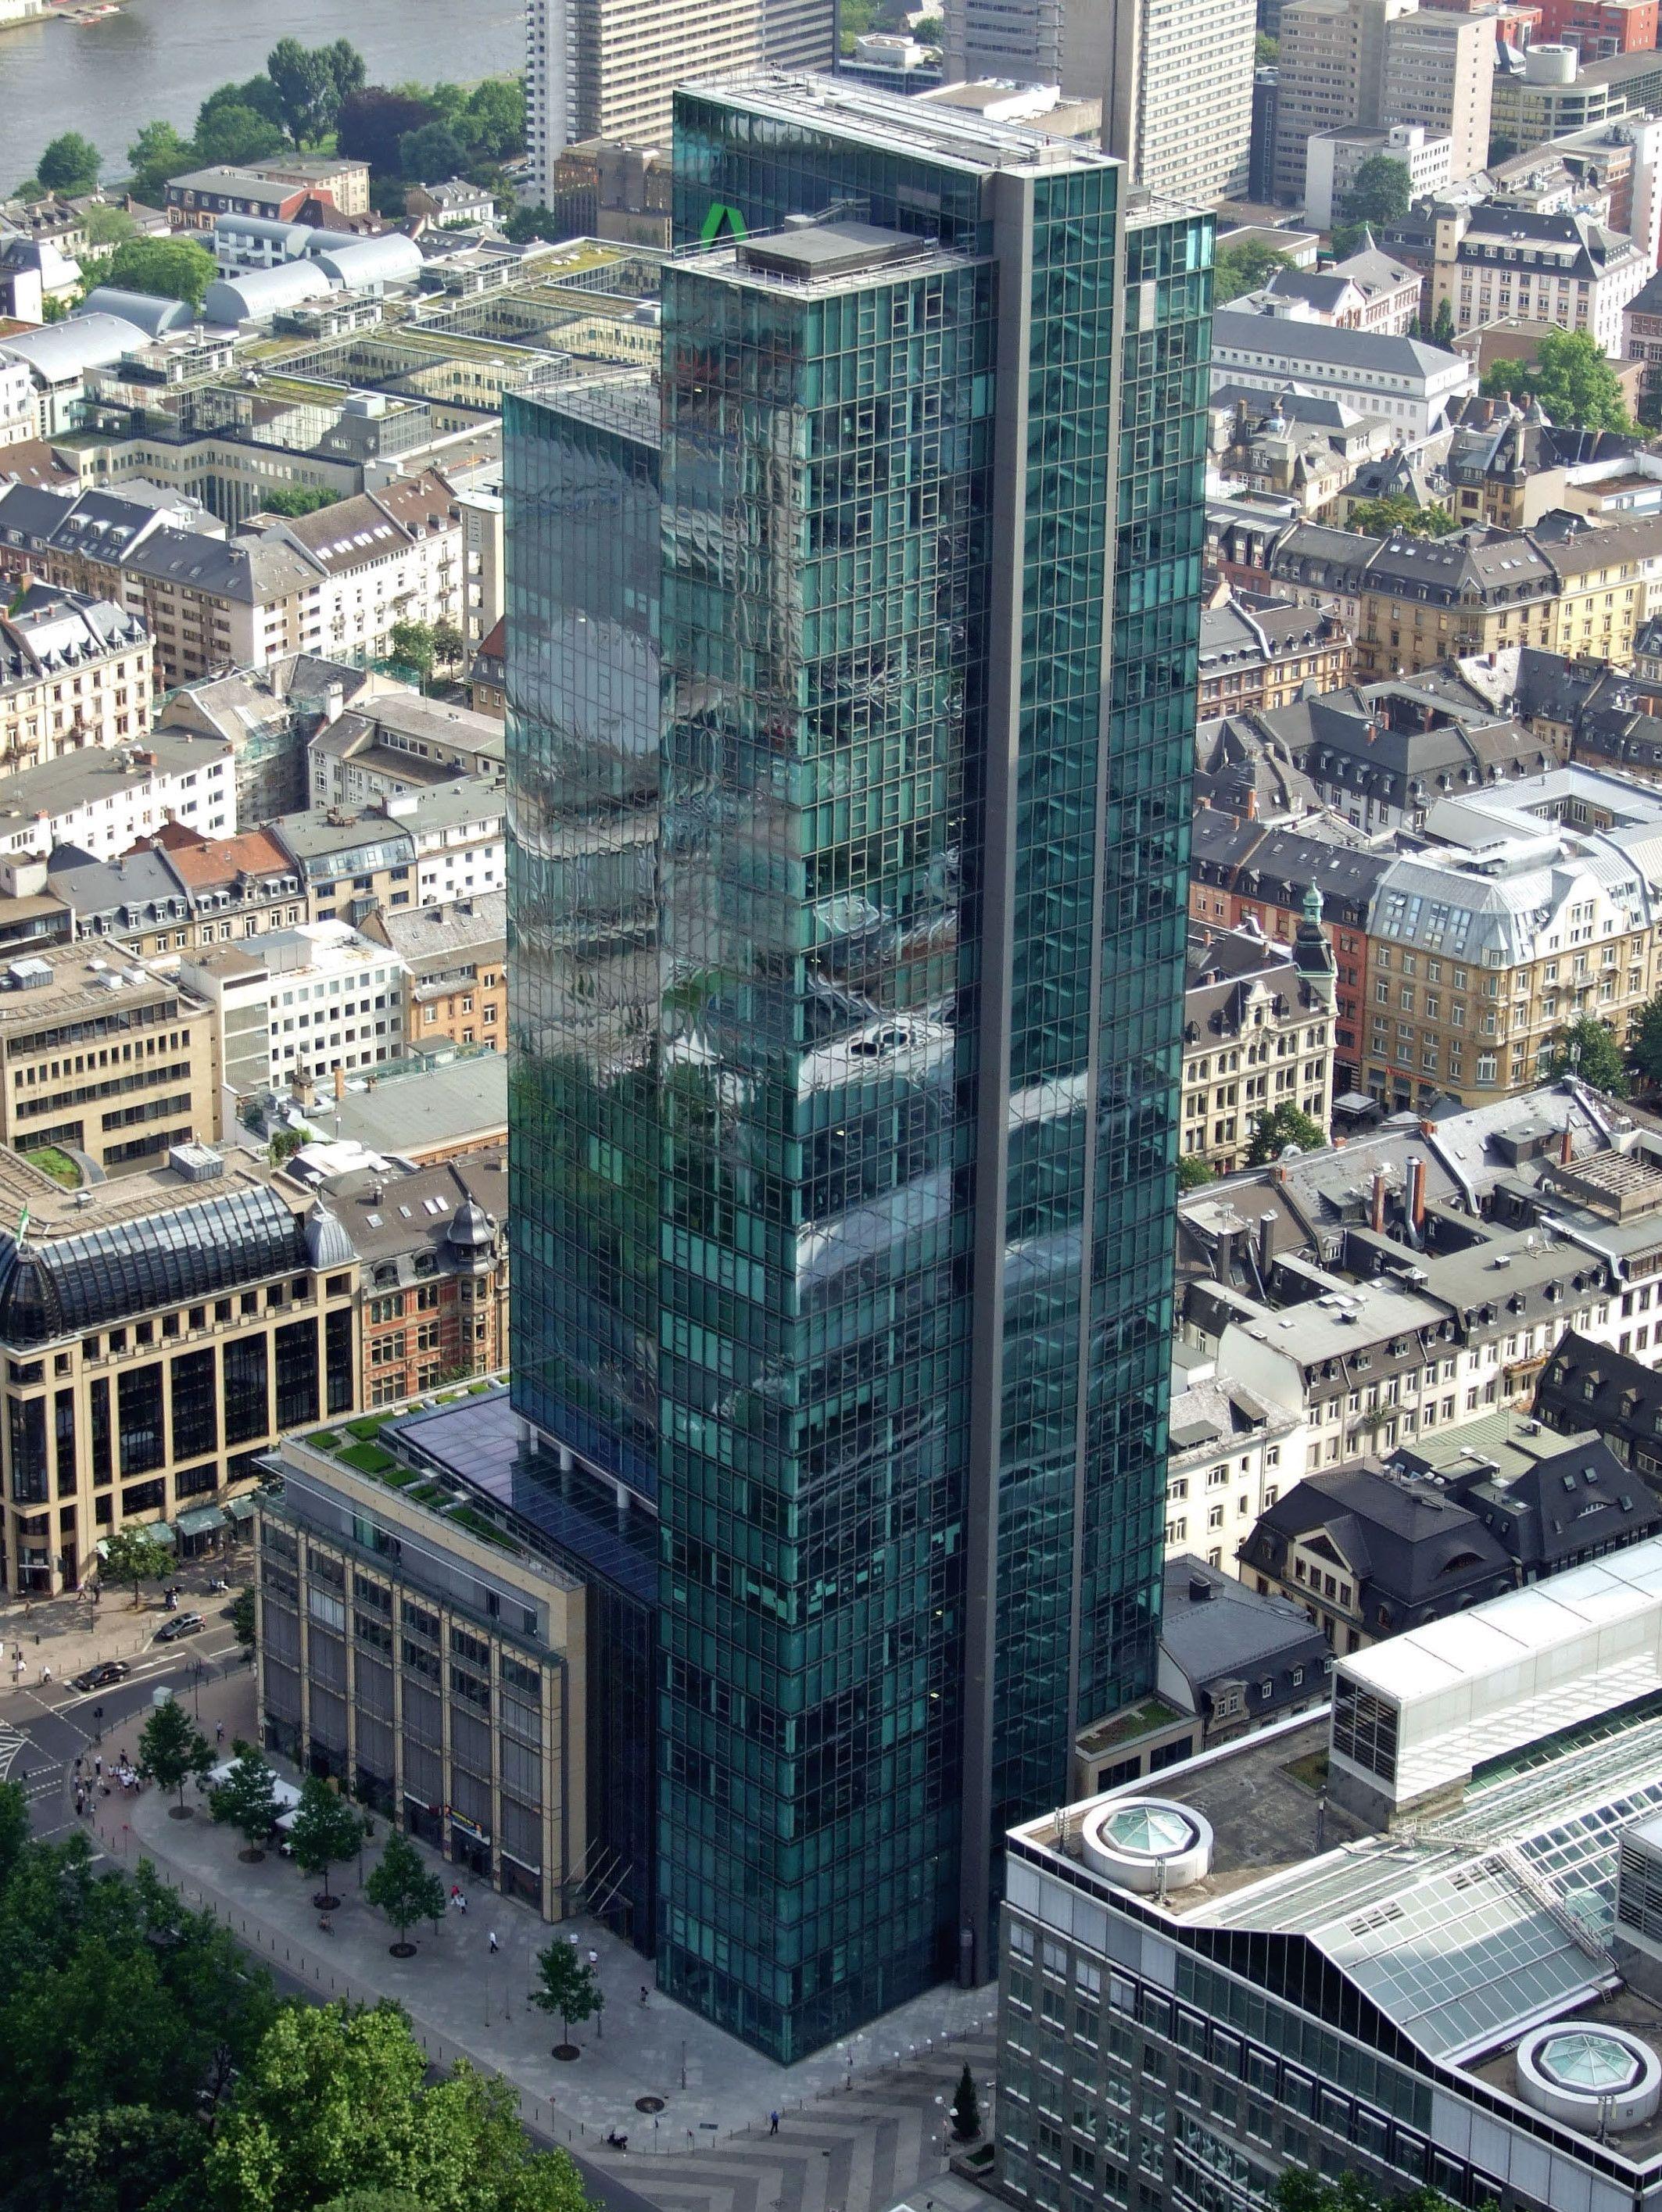 Gallileo Is A 38 Storey 136 M 446 Ft Skyscraper In The Bahnhofsviertel District Of Frankfurt Germany It Was Built From 1999 T Hochhaus Deutschland Dresdner